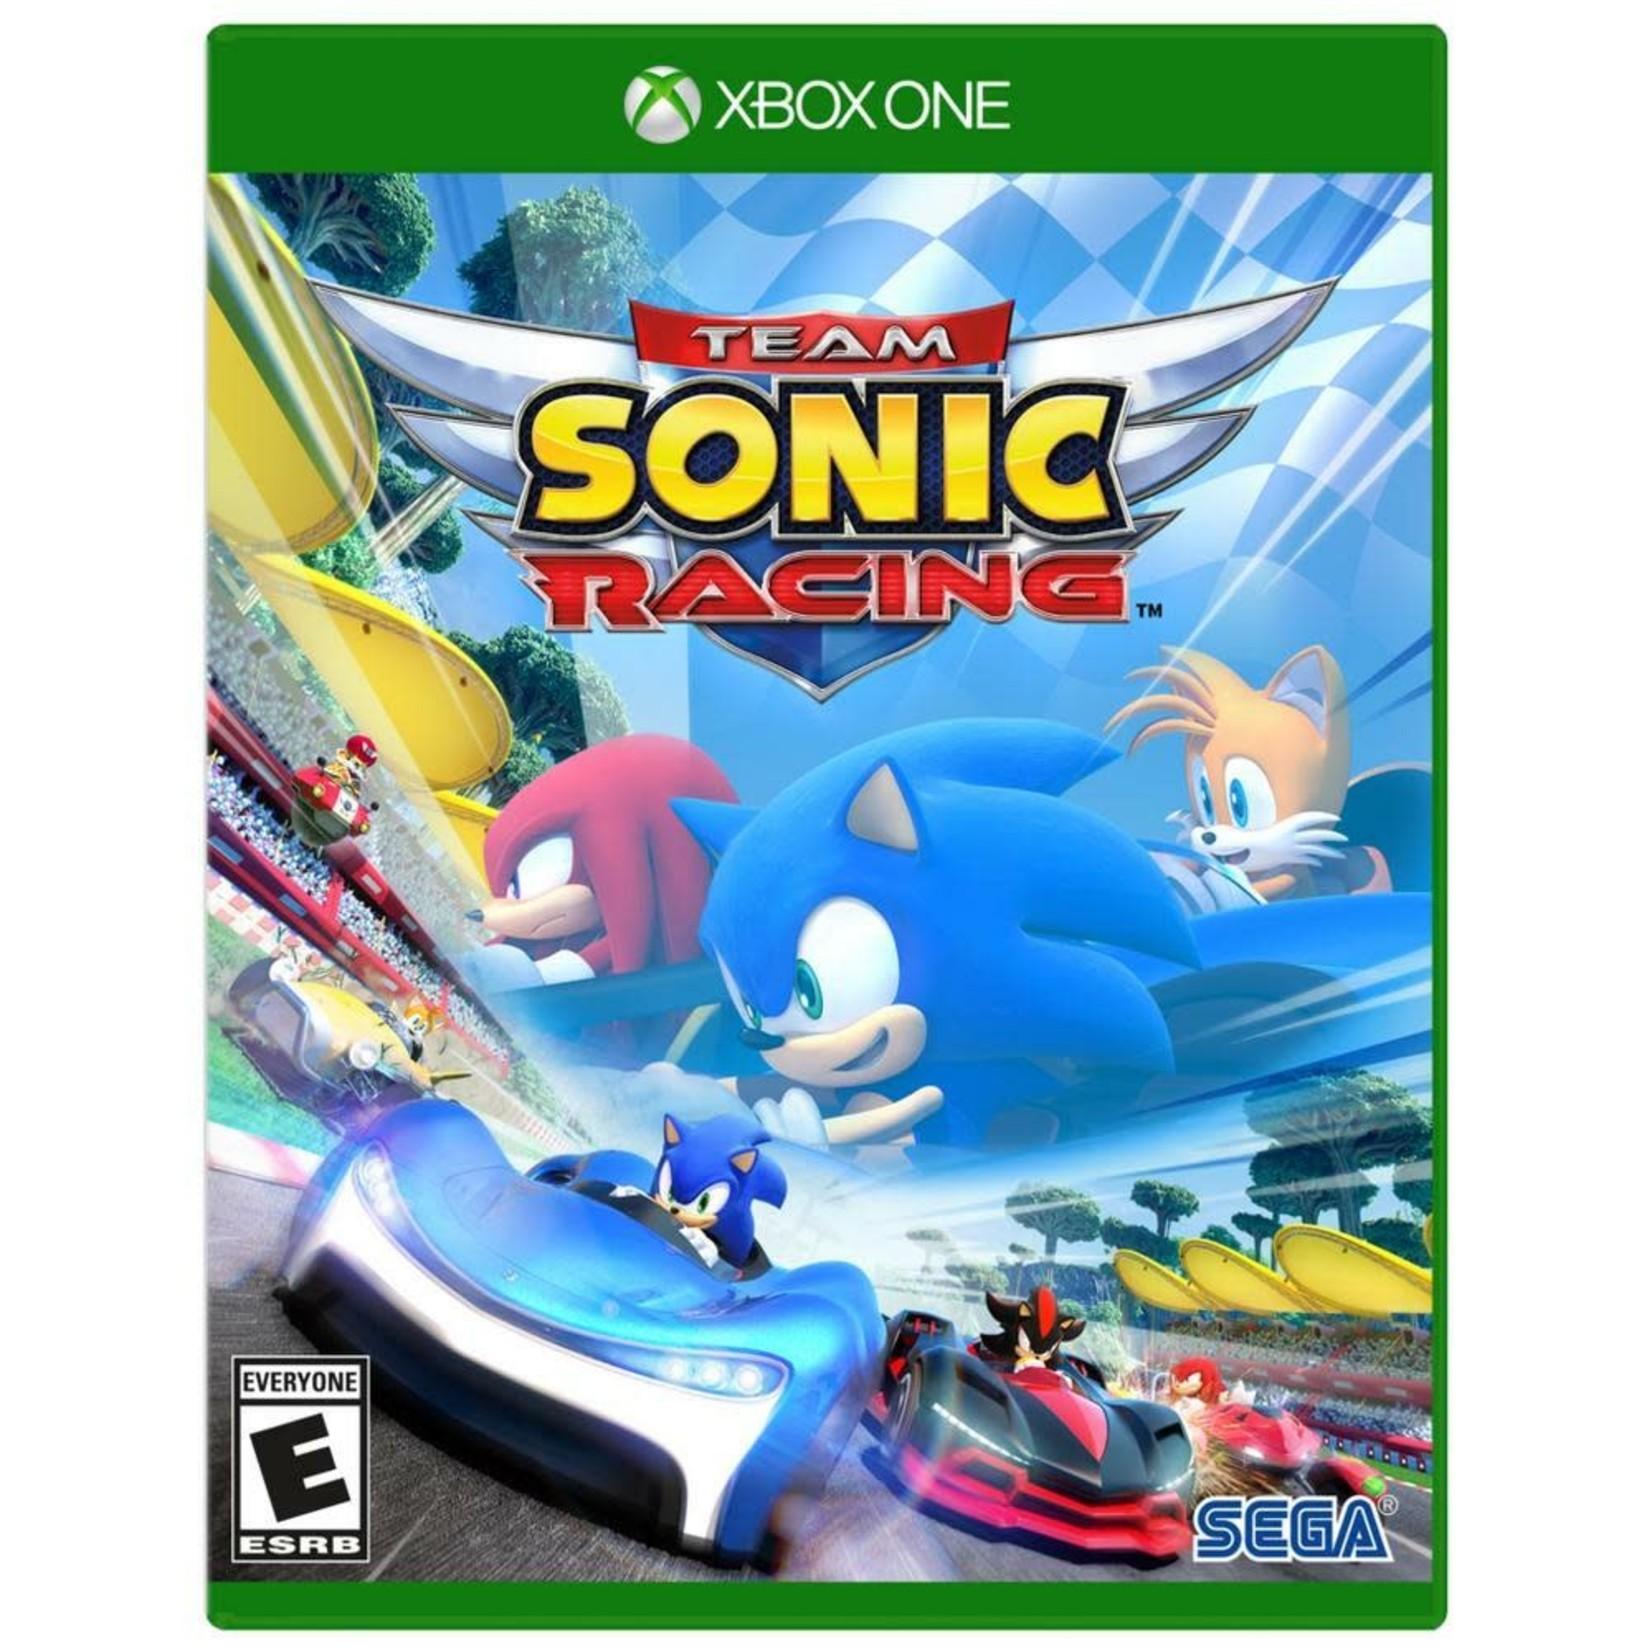 XB1-Team Sonic Racing